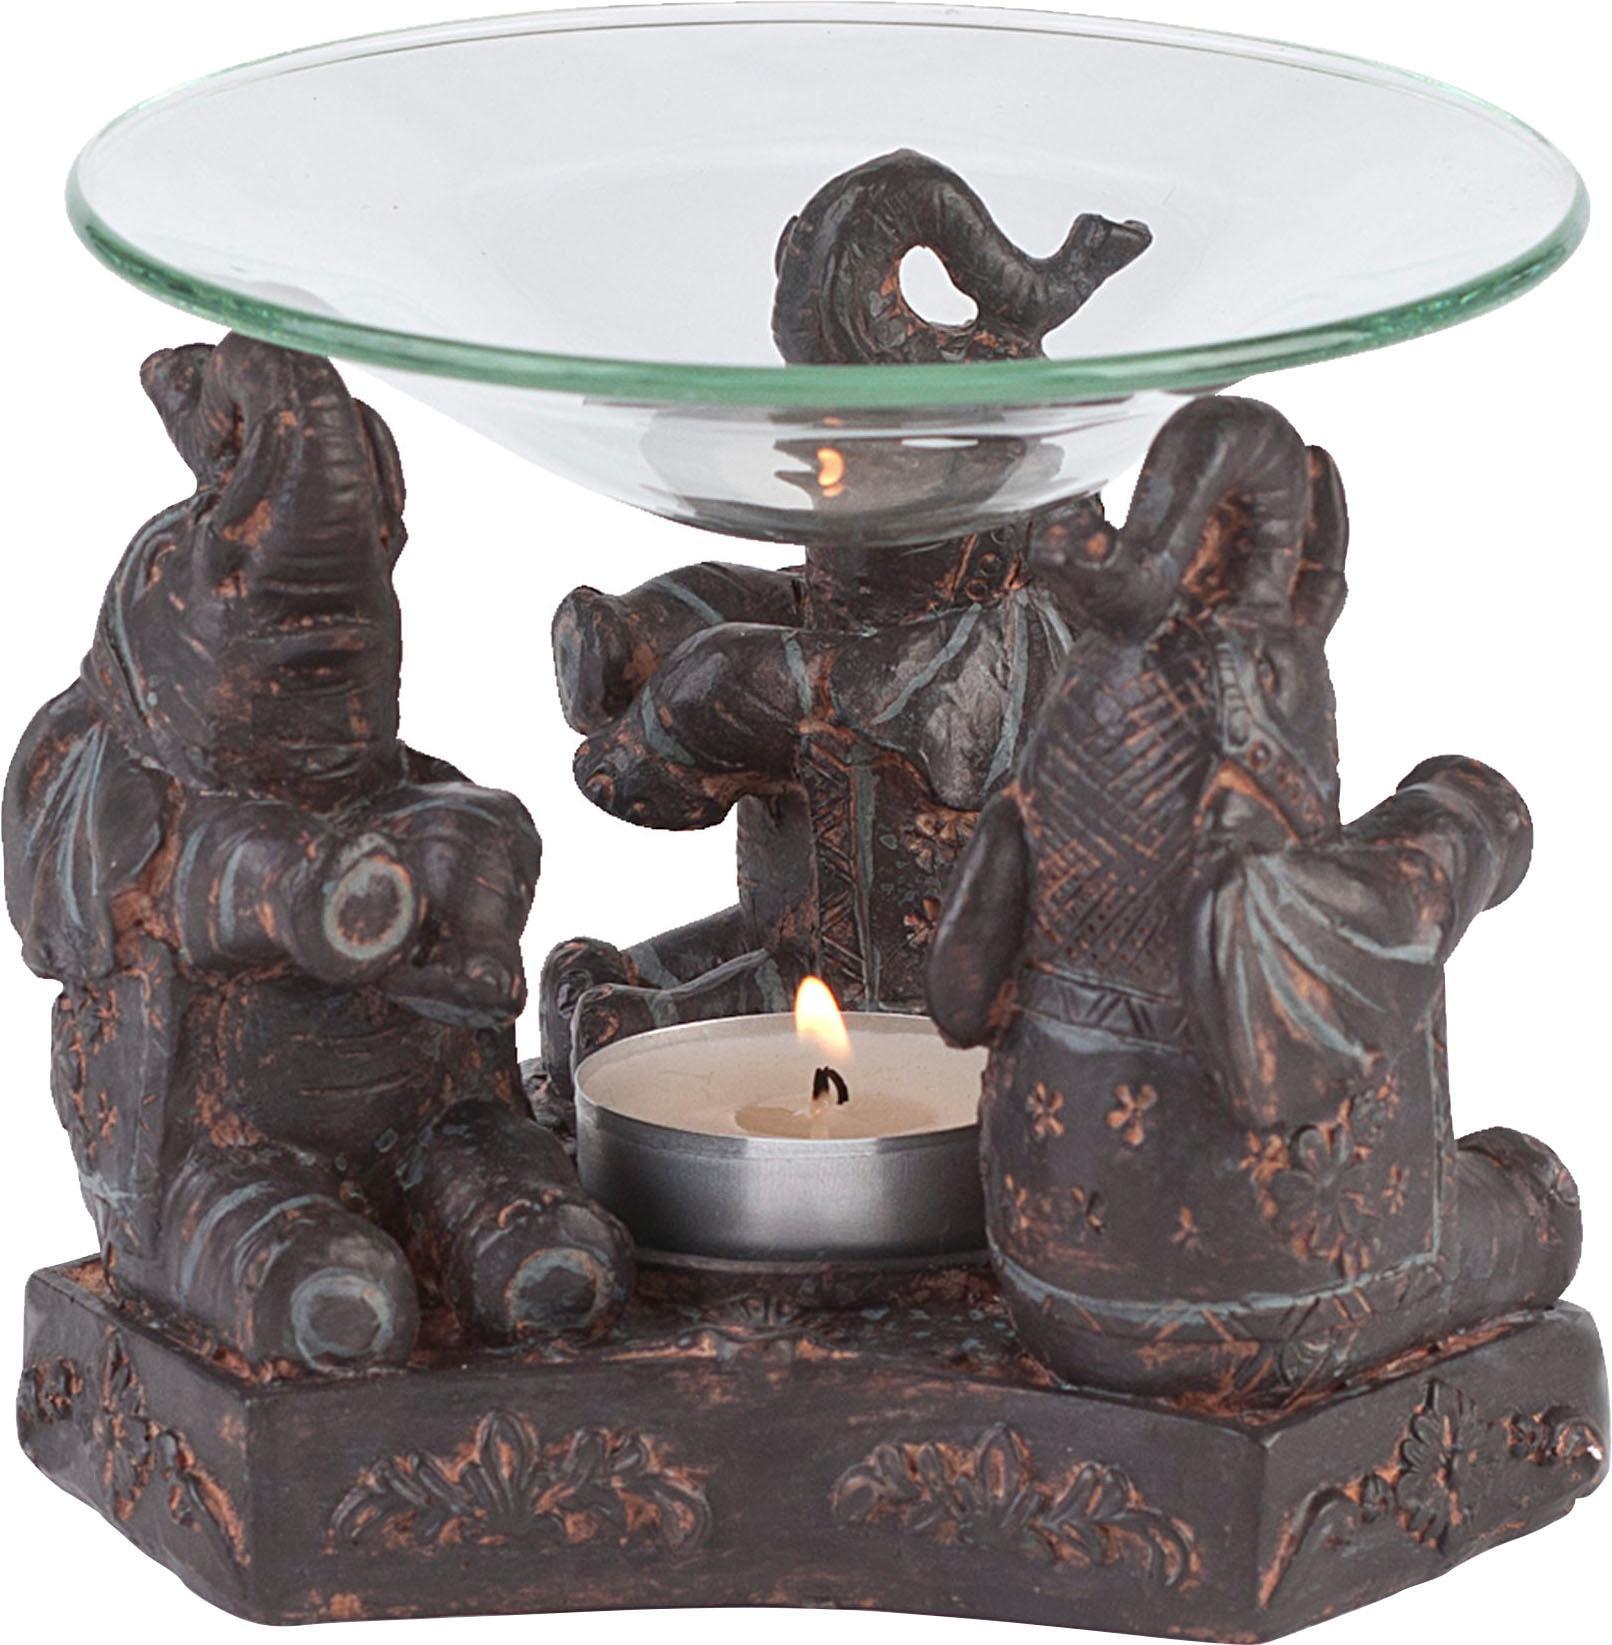 pajoma Duftlampe Elefant braun Kerzenhalter Kerzen Laternen Wohnaccessoires